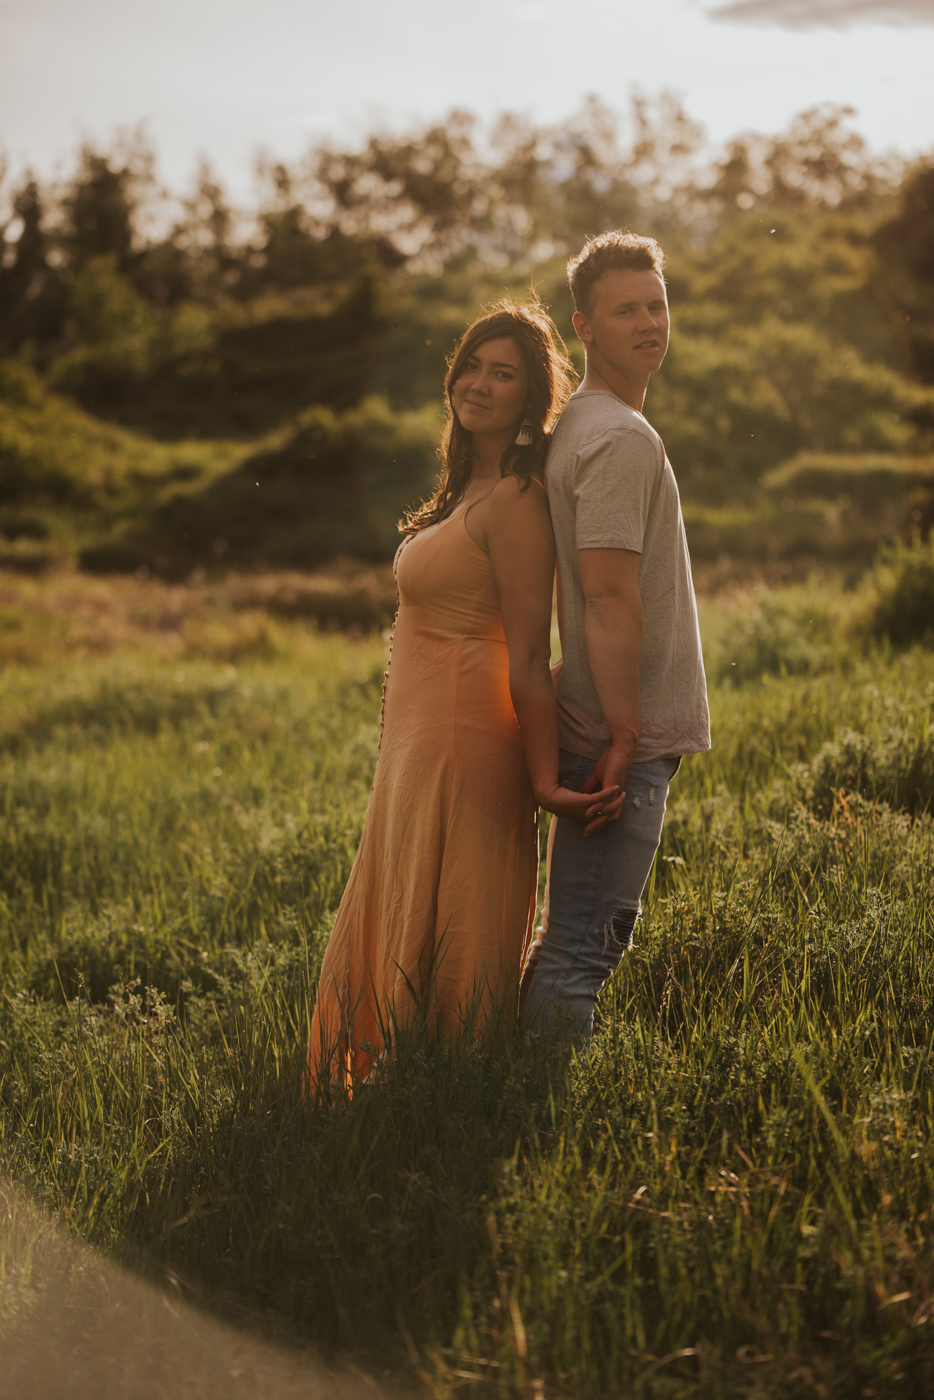 tyraephotography_photographer_wedding_elopement_engagement_photography-6204.jpg